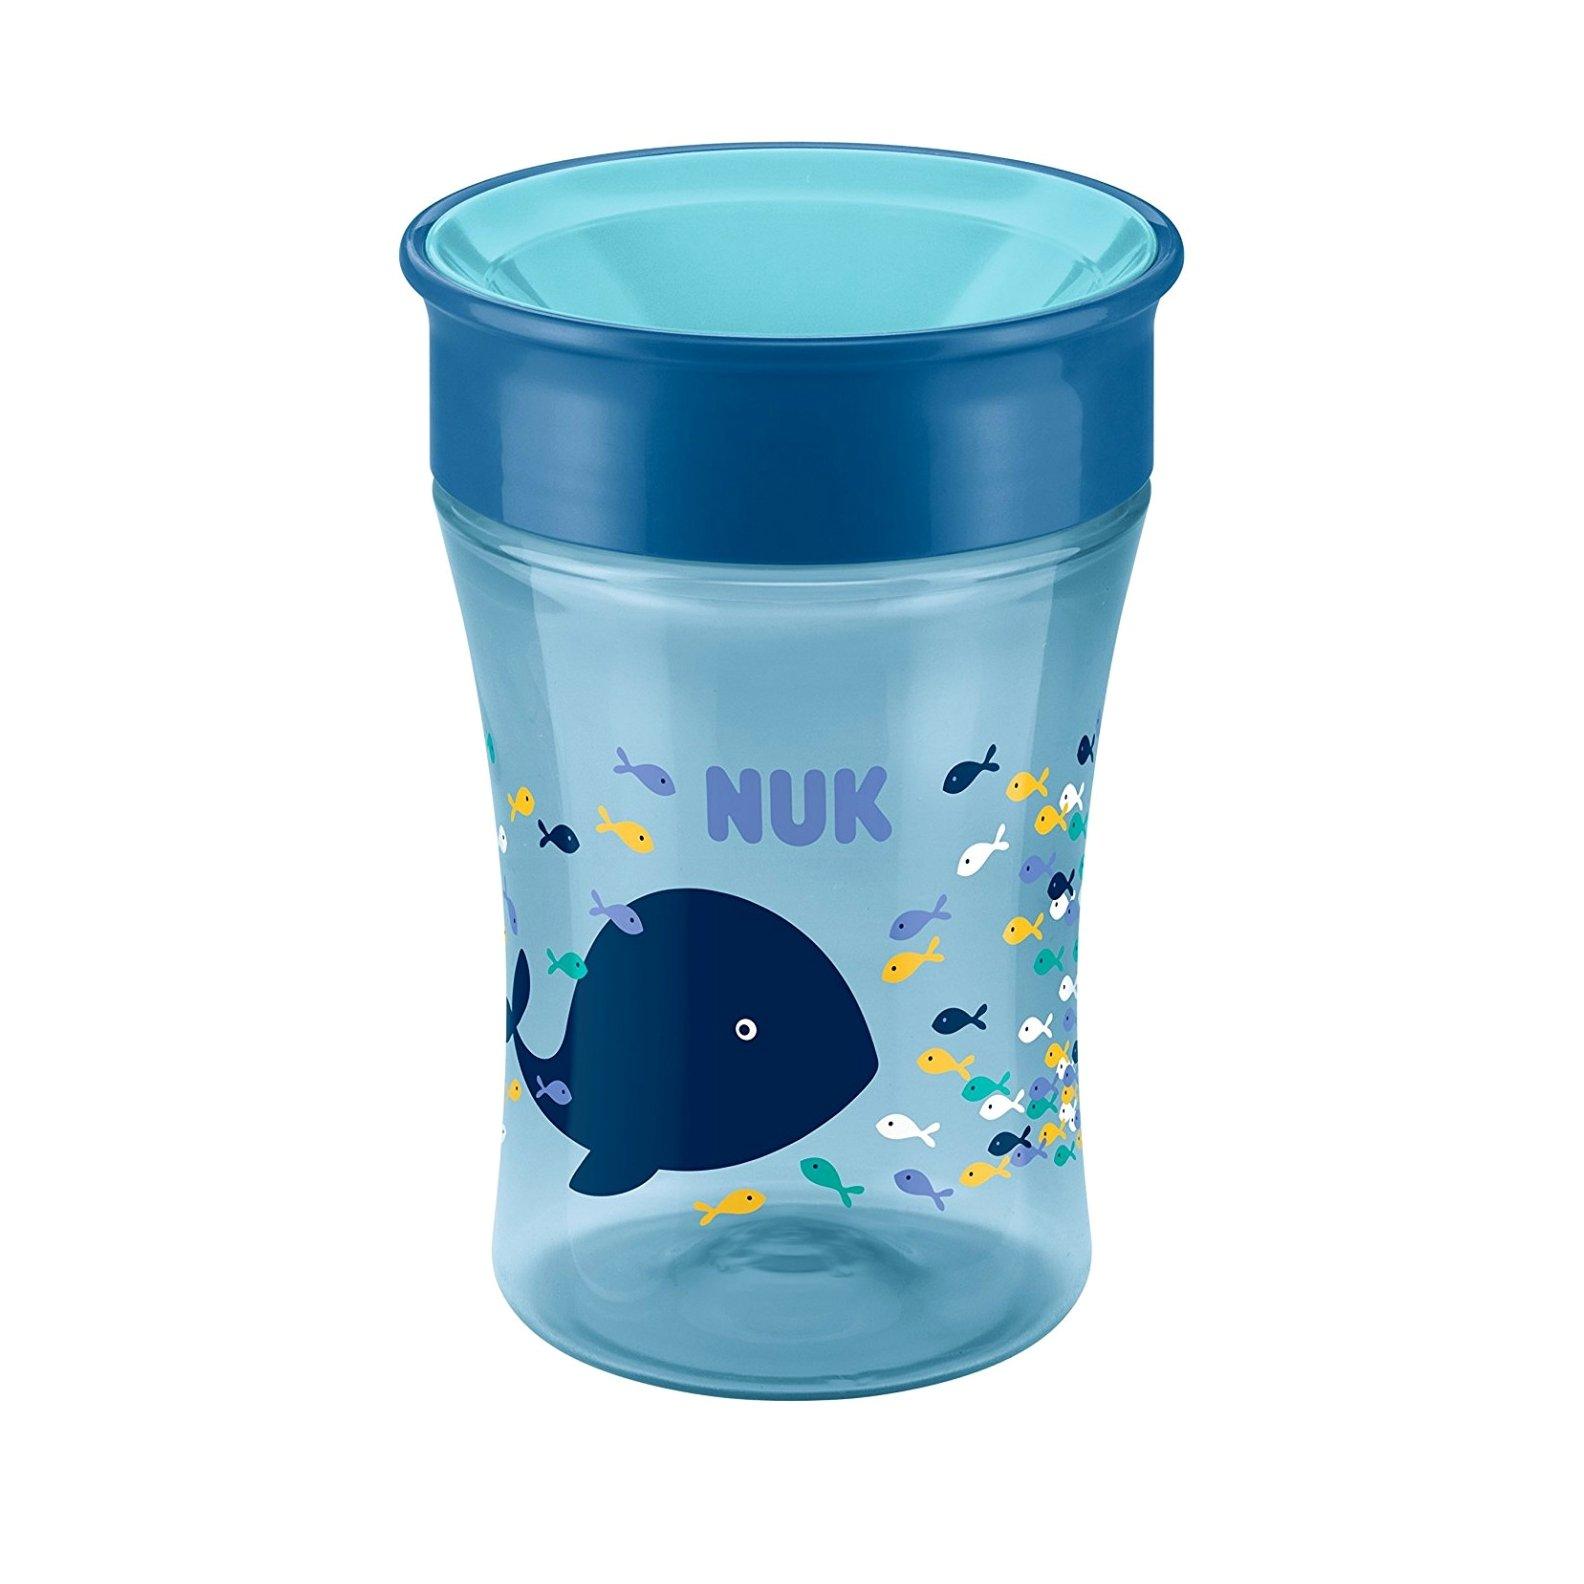 Nuk Magic Cup Ποτήρι Εκπαίδευσης Πολυπροπυλενίουμε Καινοτόμο Χείλος 8+m BPA Free 230ml – μπλέ